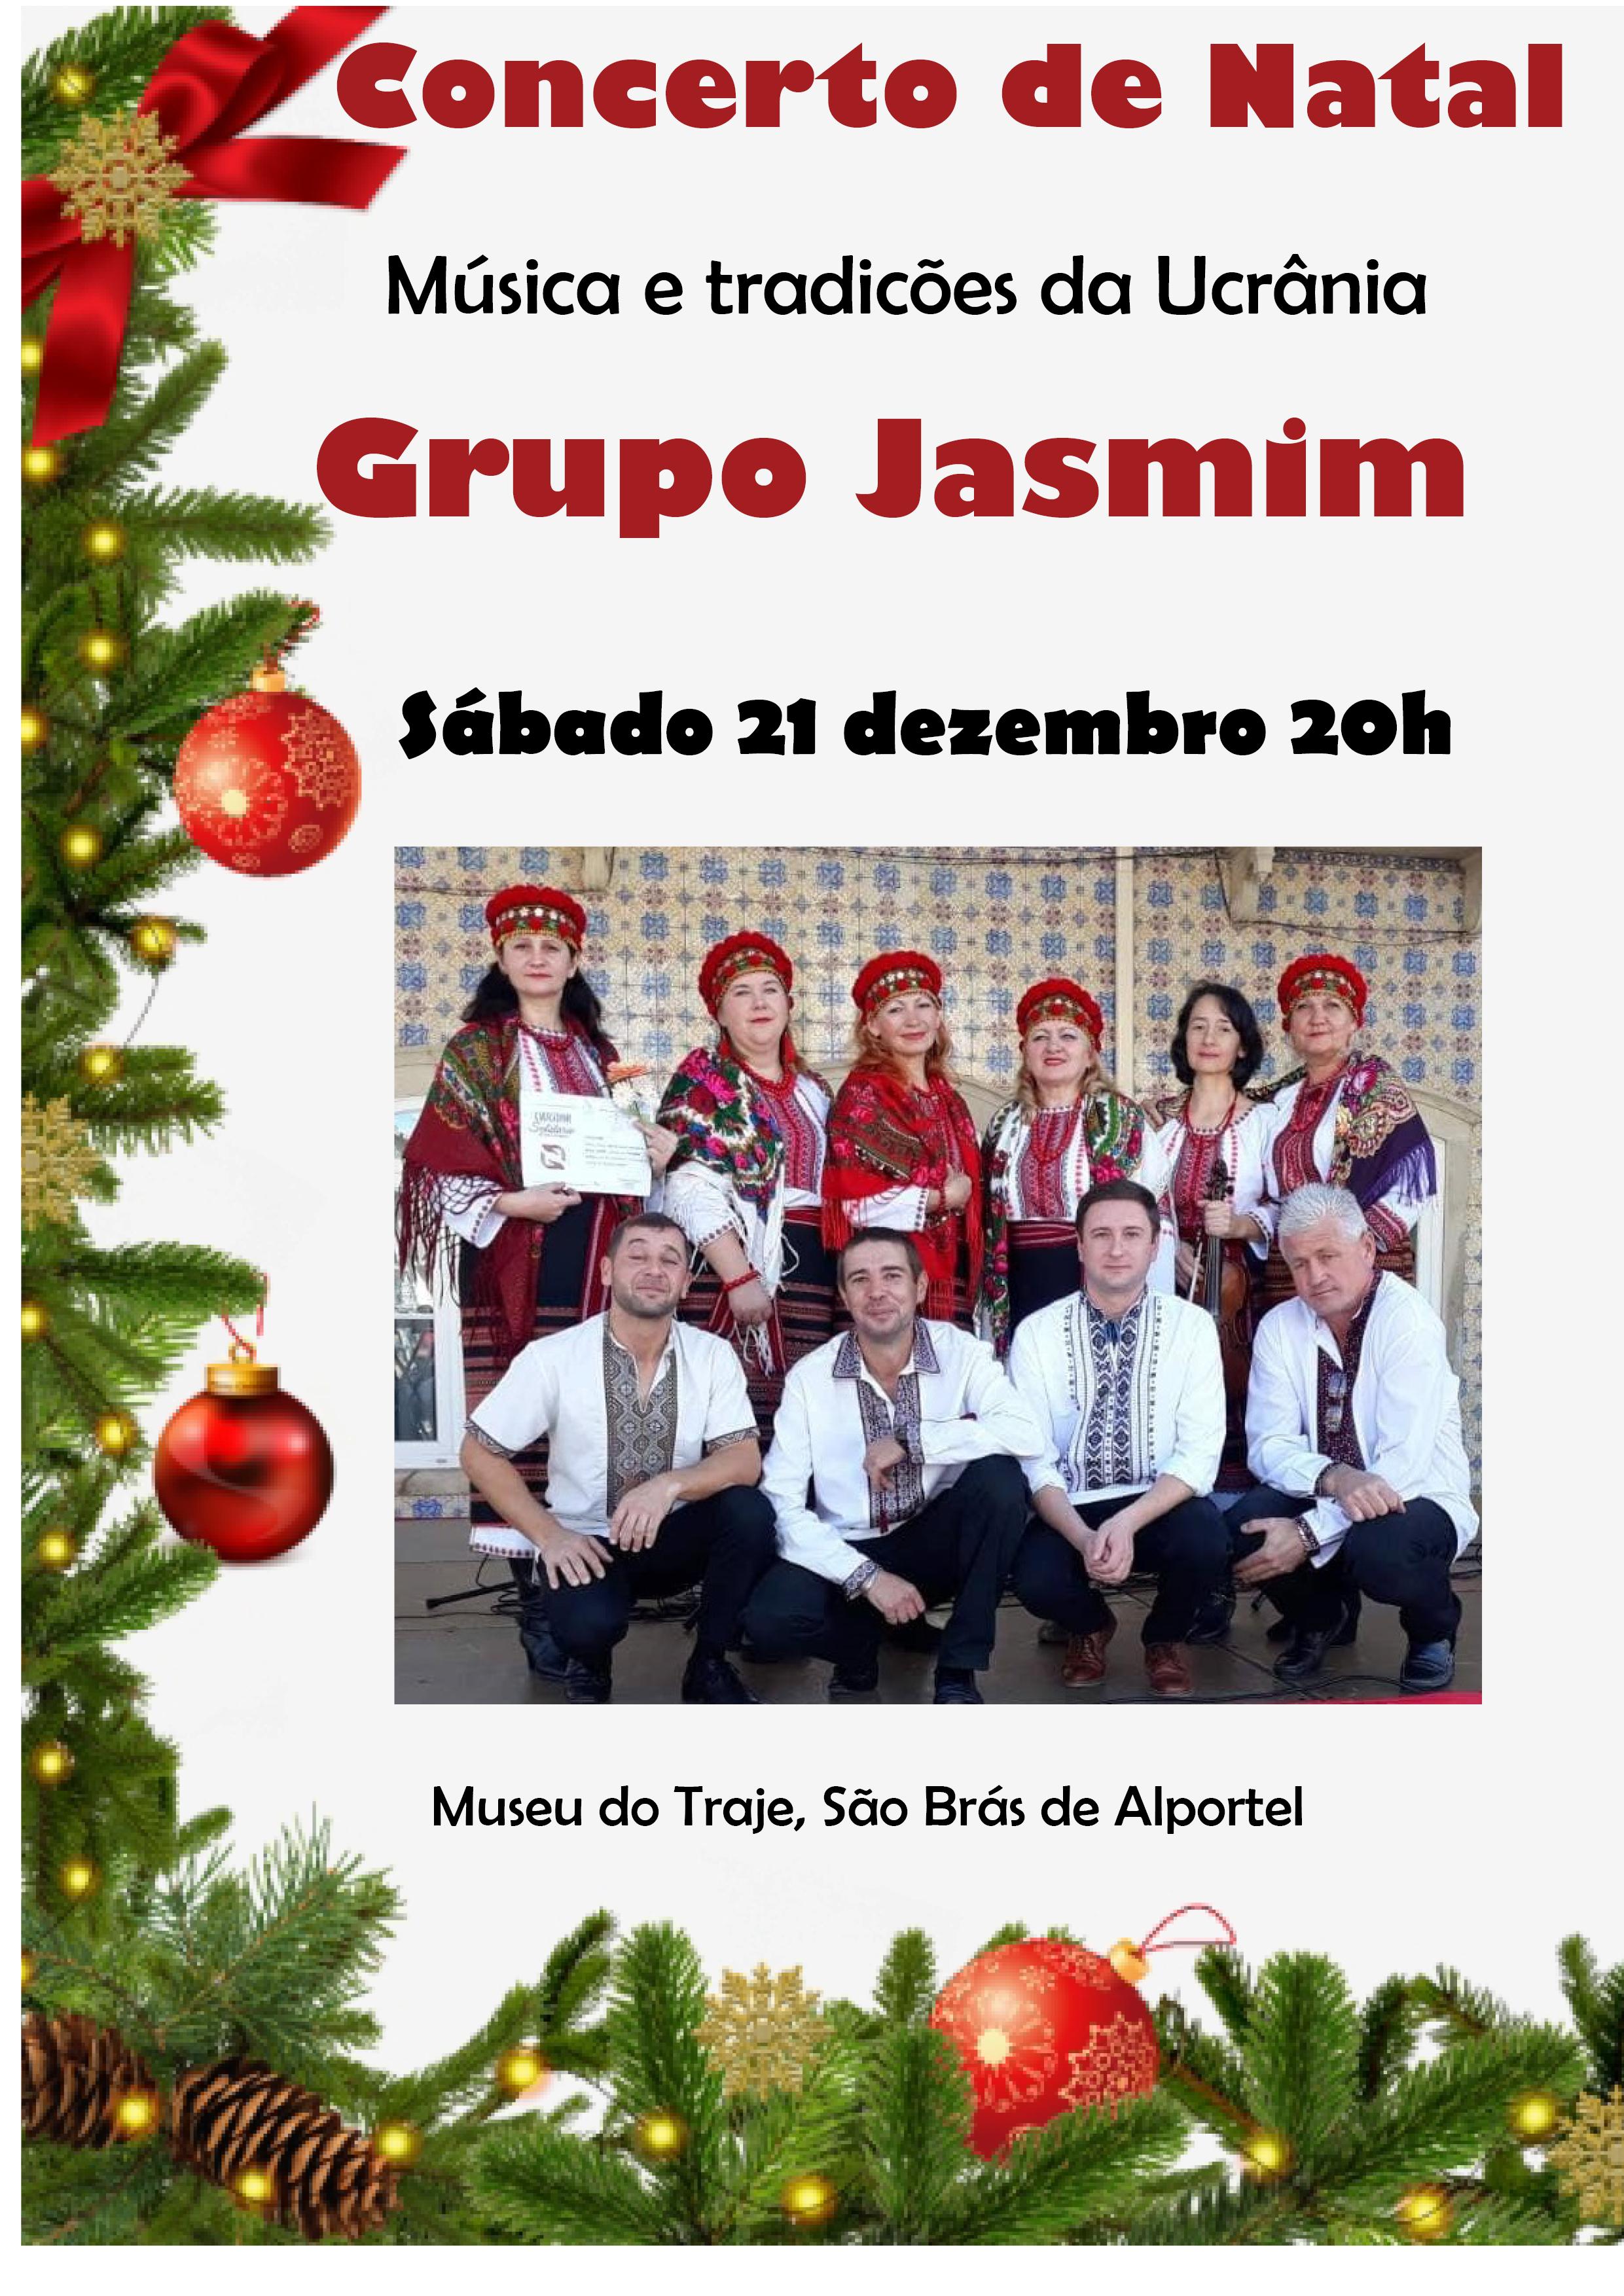 cartaz do concerto de natal pelo grupo jasmon